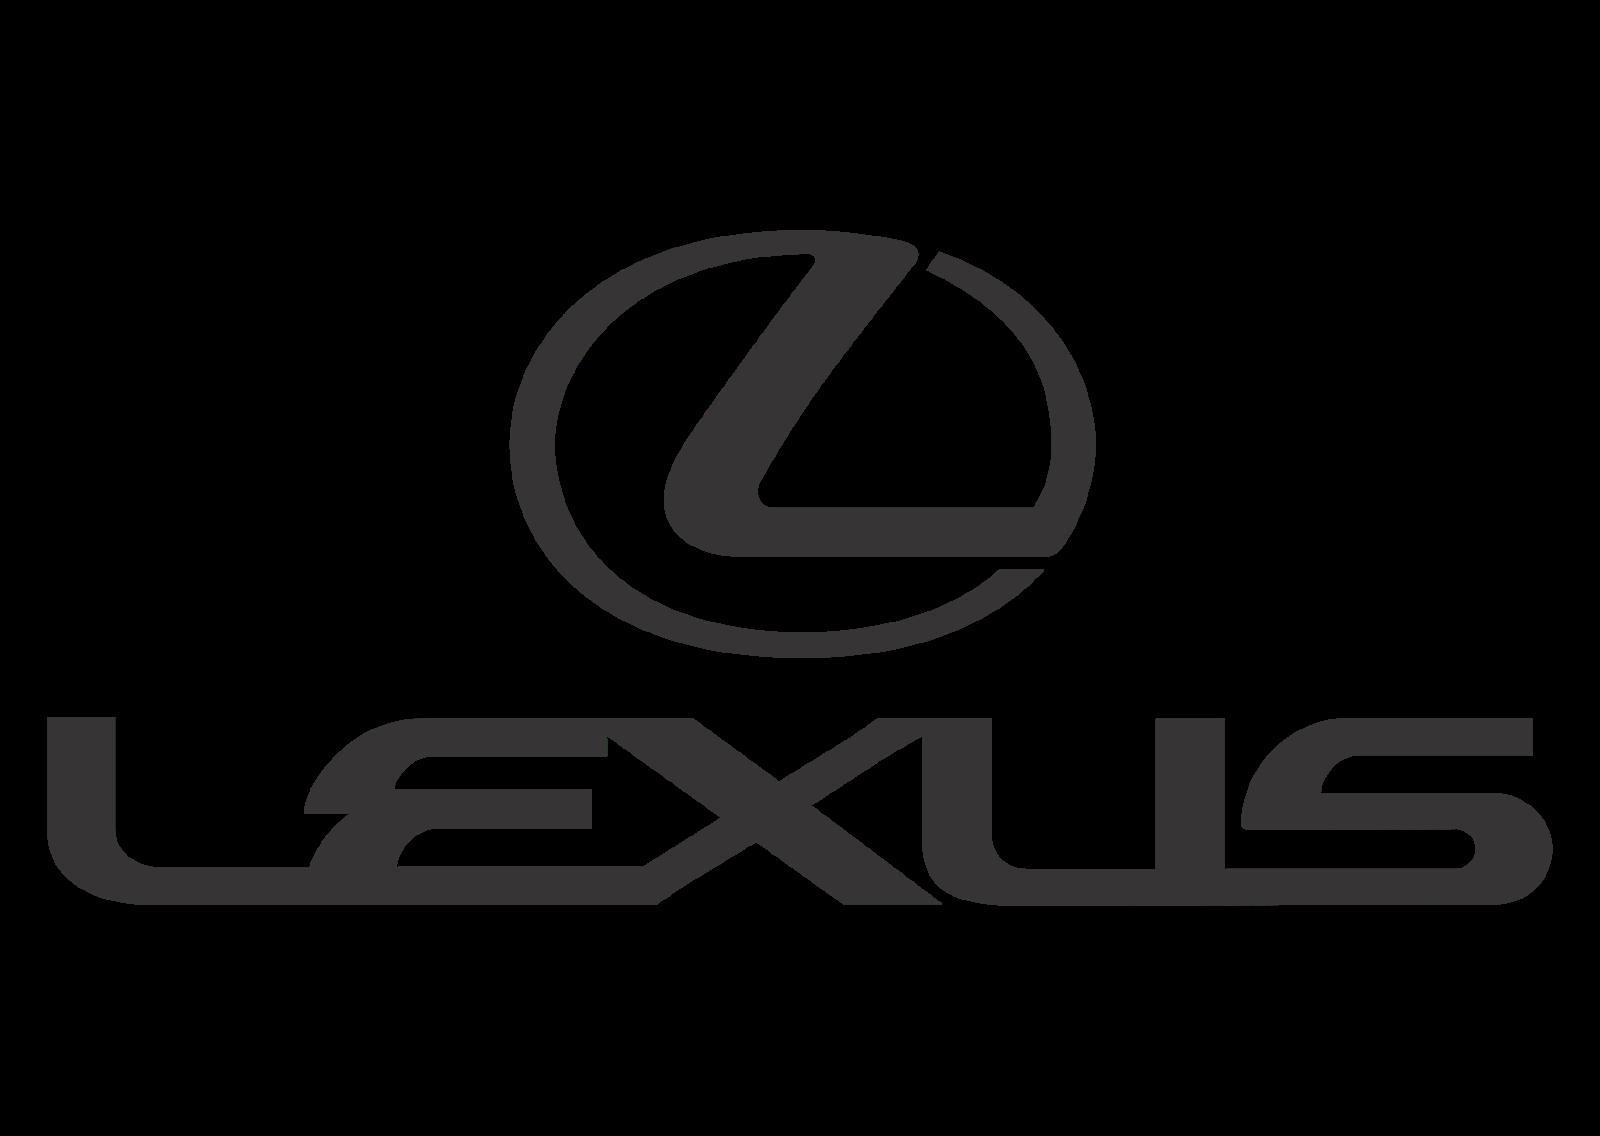 lexus logo design png download Lexus-logo-vector download - Gucci Logo Eps PNG